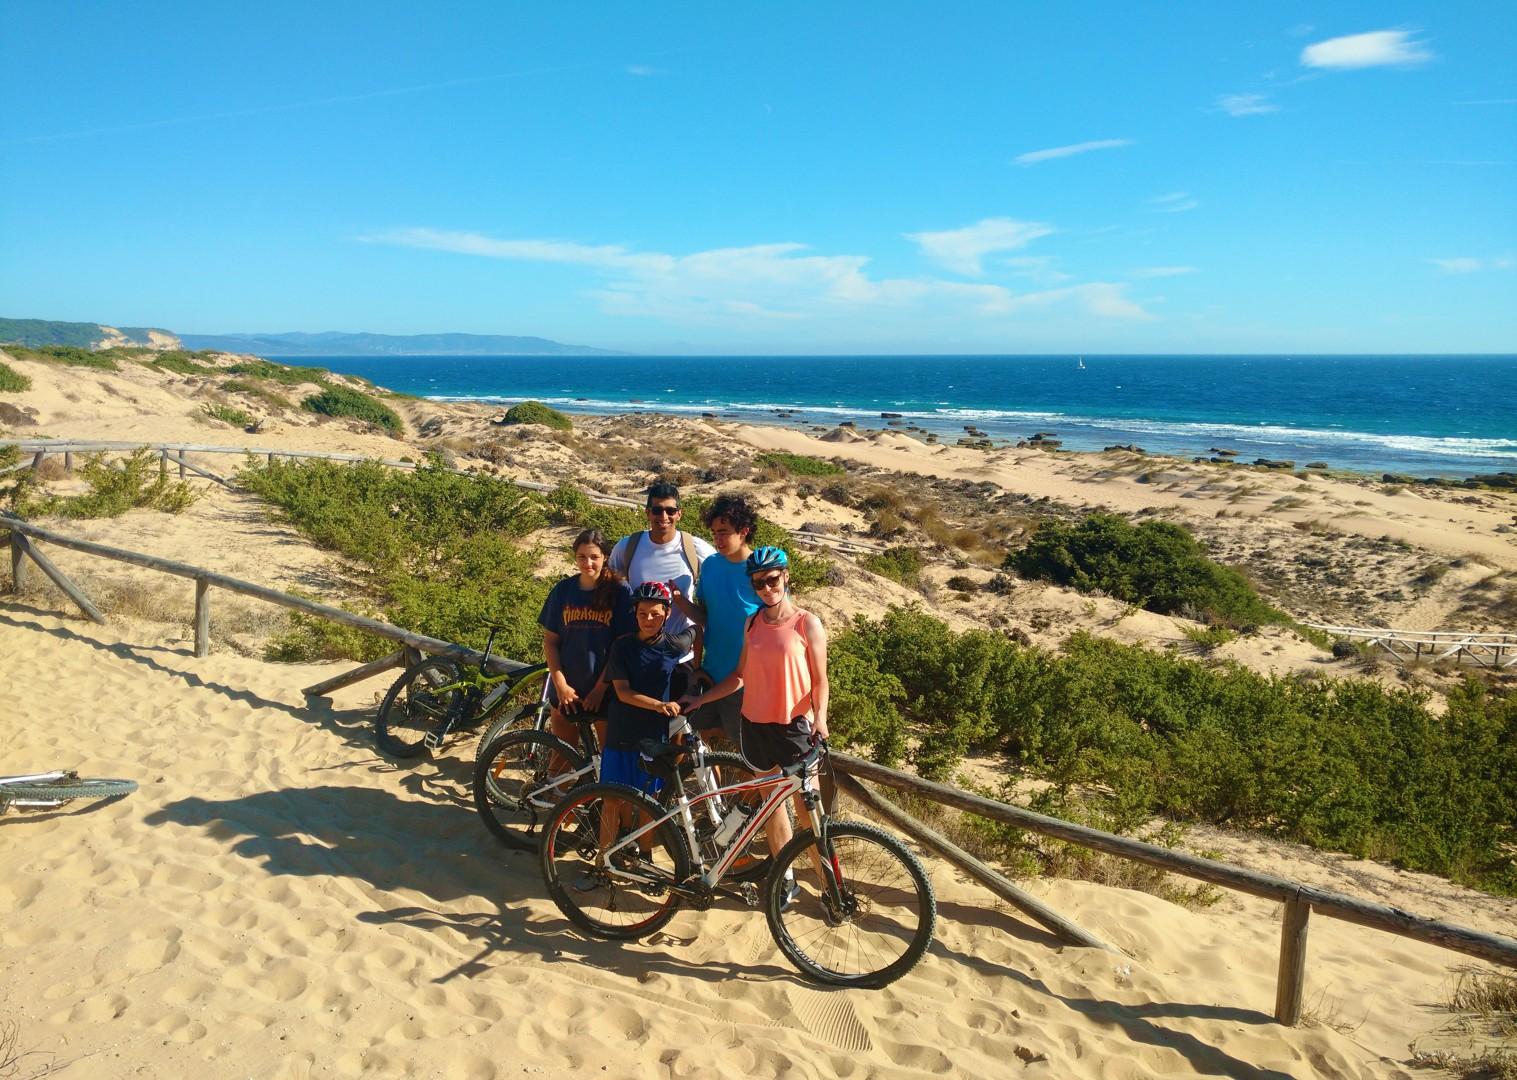 IMG_20171027_161020433.jpg - Southern Spain - Coastal Adventurer - Family Cycling